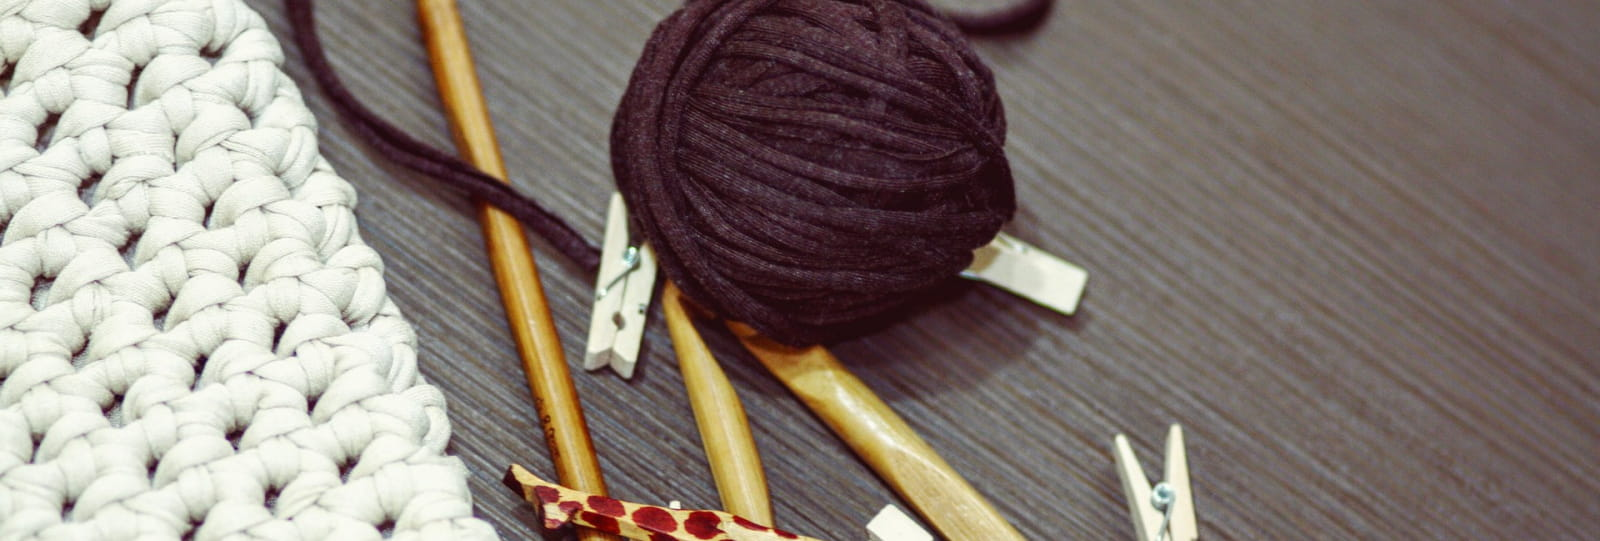 Atelier tricot et crochet ... - ANNULE